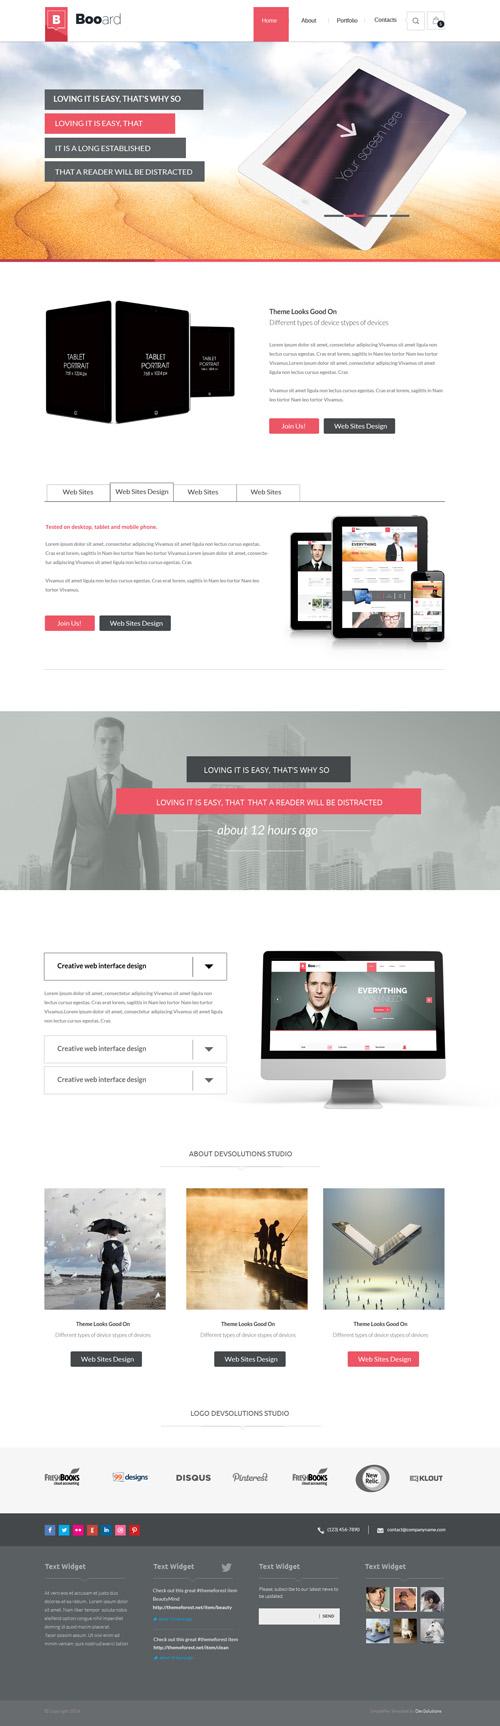 Booard - Corporate PSD Template